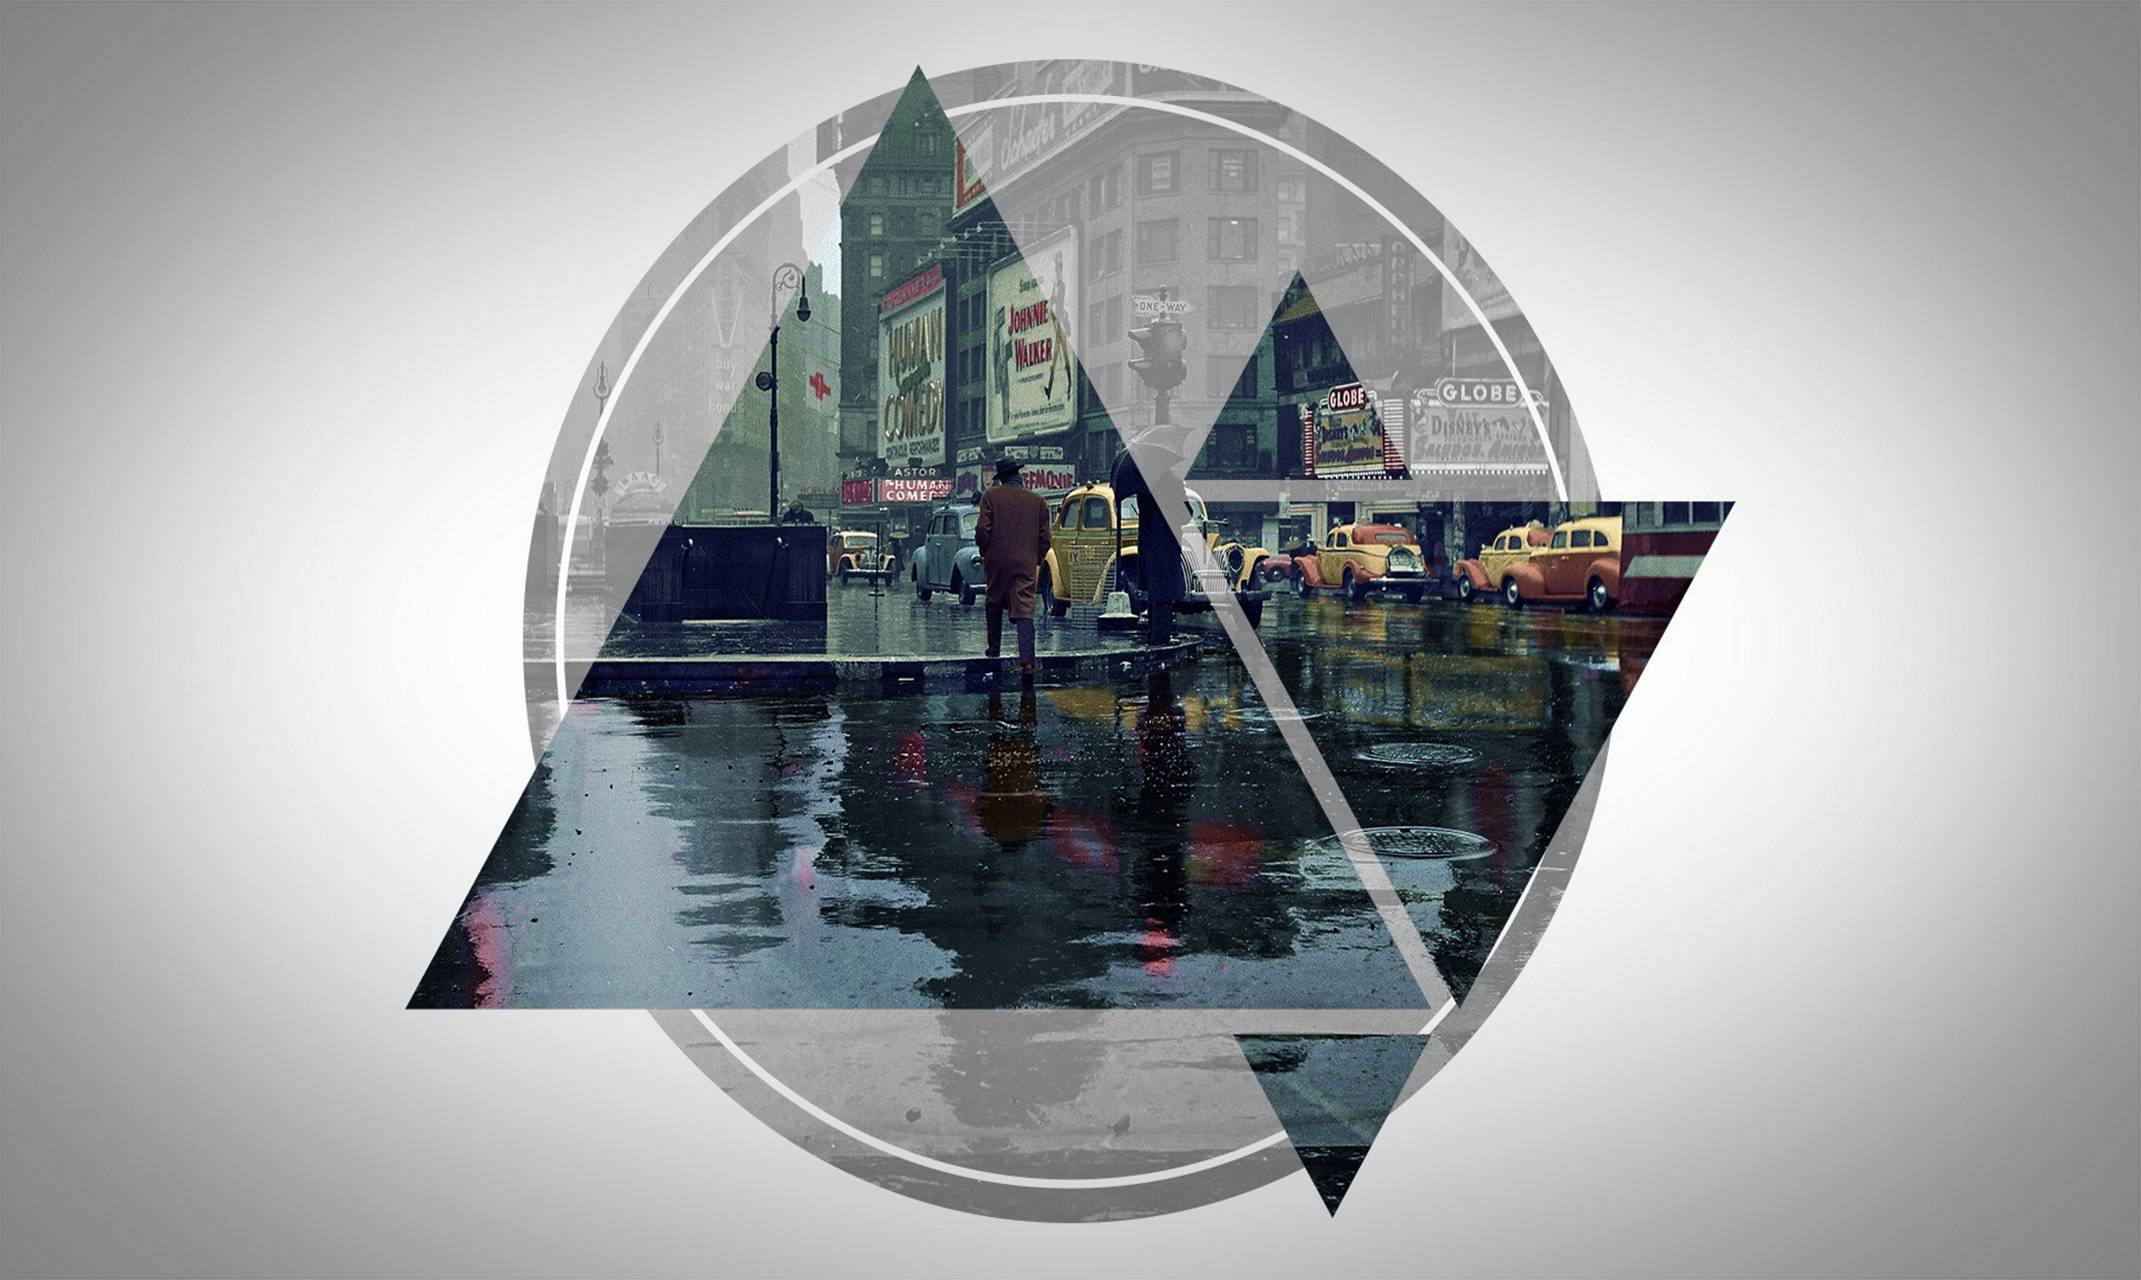 Triangle City